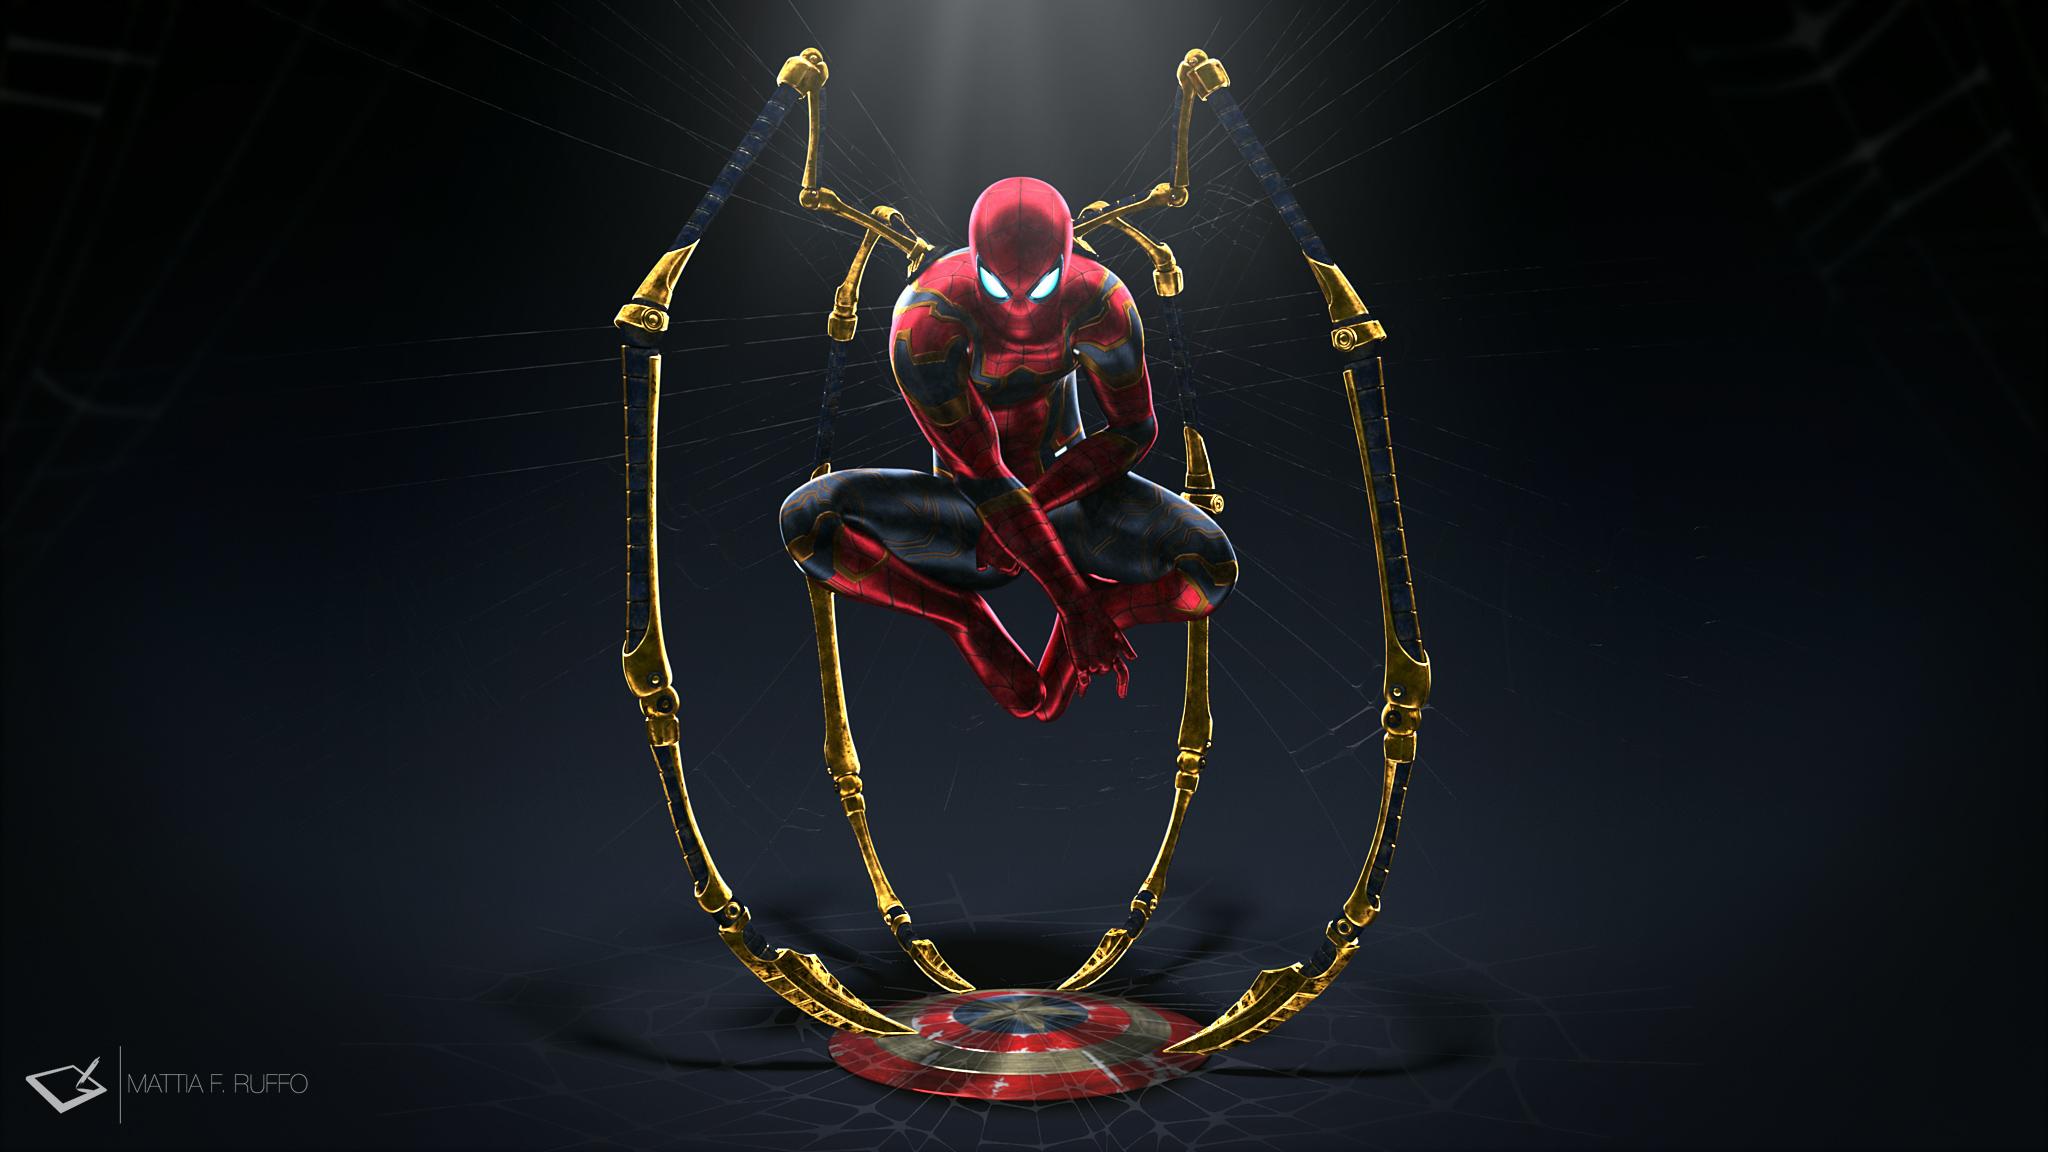 720x1280 Marvel Iron Spiderman Moto Gx Xperia Z1z3 Compact